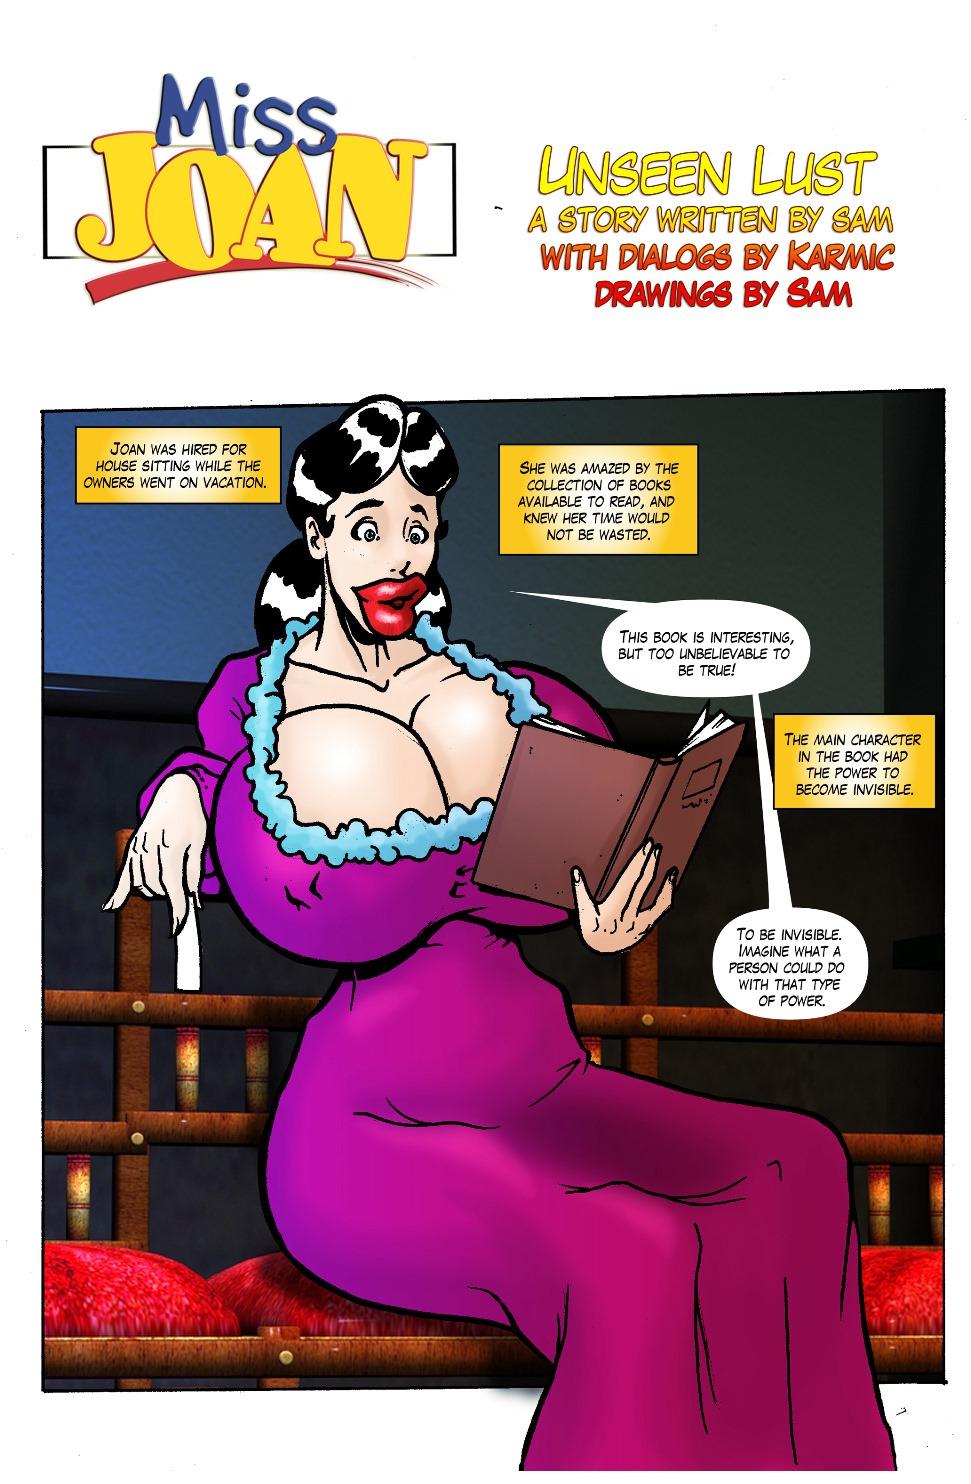 Miss Joan- Unseen Lust image 1